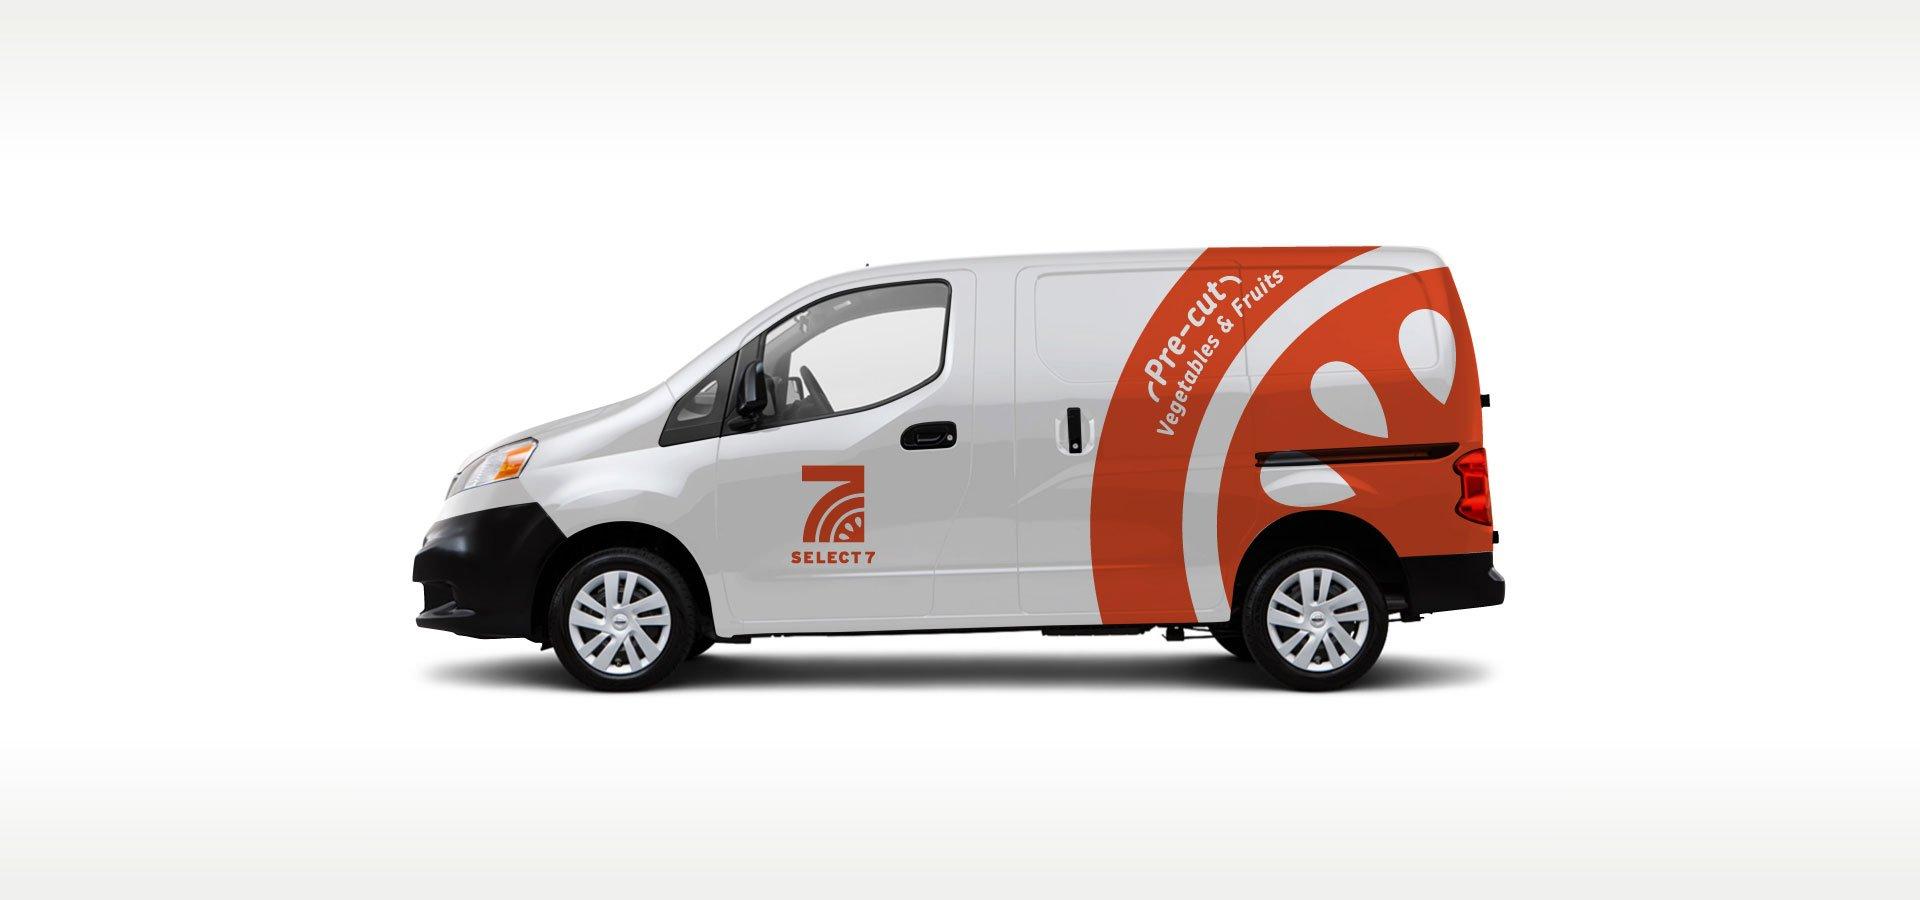 Select7 car graphics